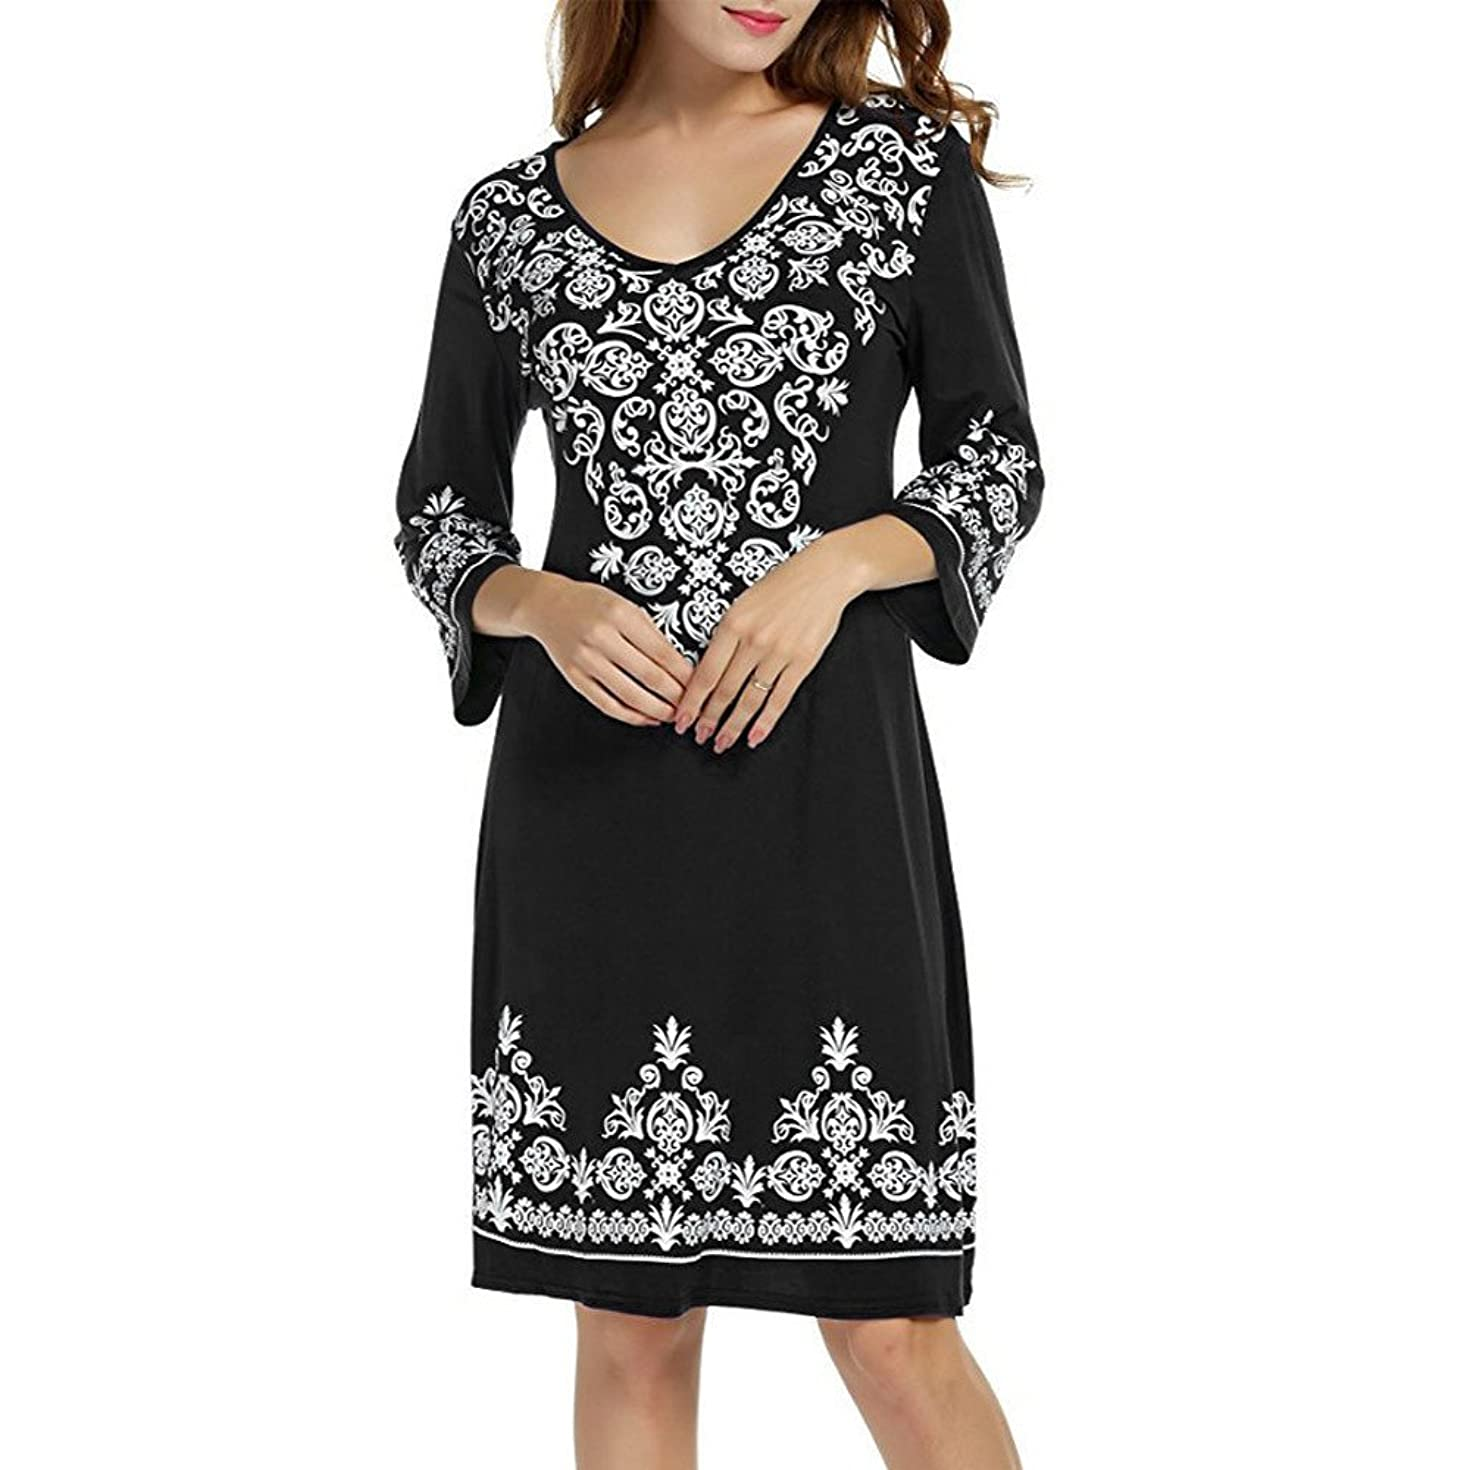 Fainosmny Summer Loose Dress Fashion Print Beach Sundress for Women 3/4 Sleeve Party Dress Casual Swing T-Shirt Tunic Dress